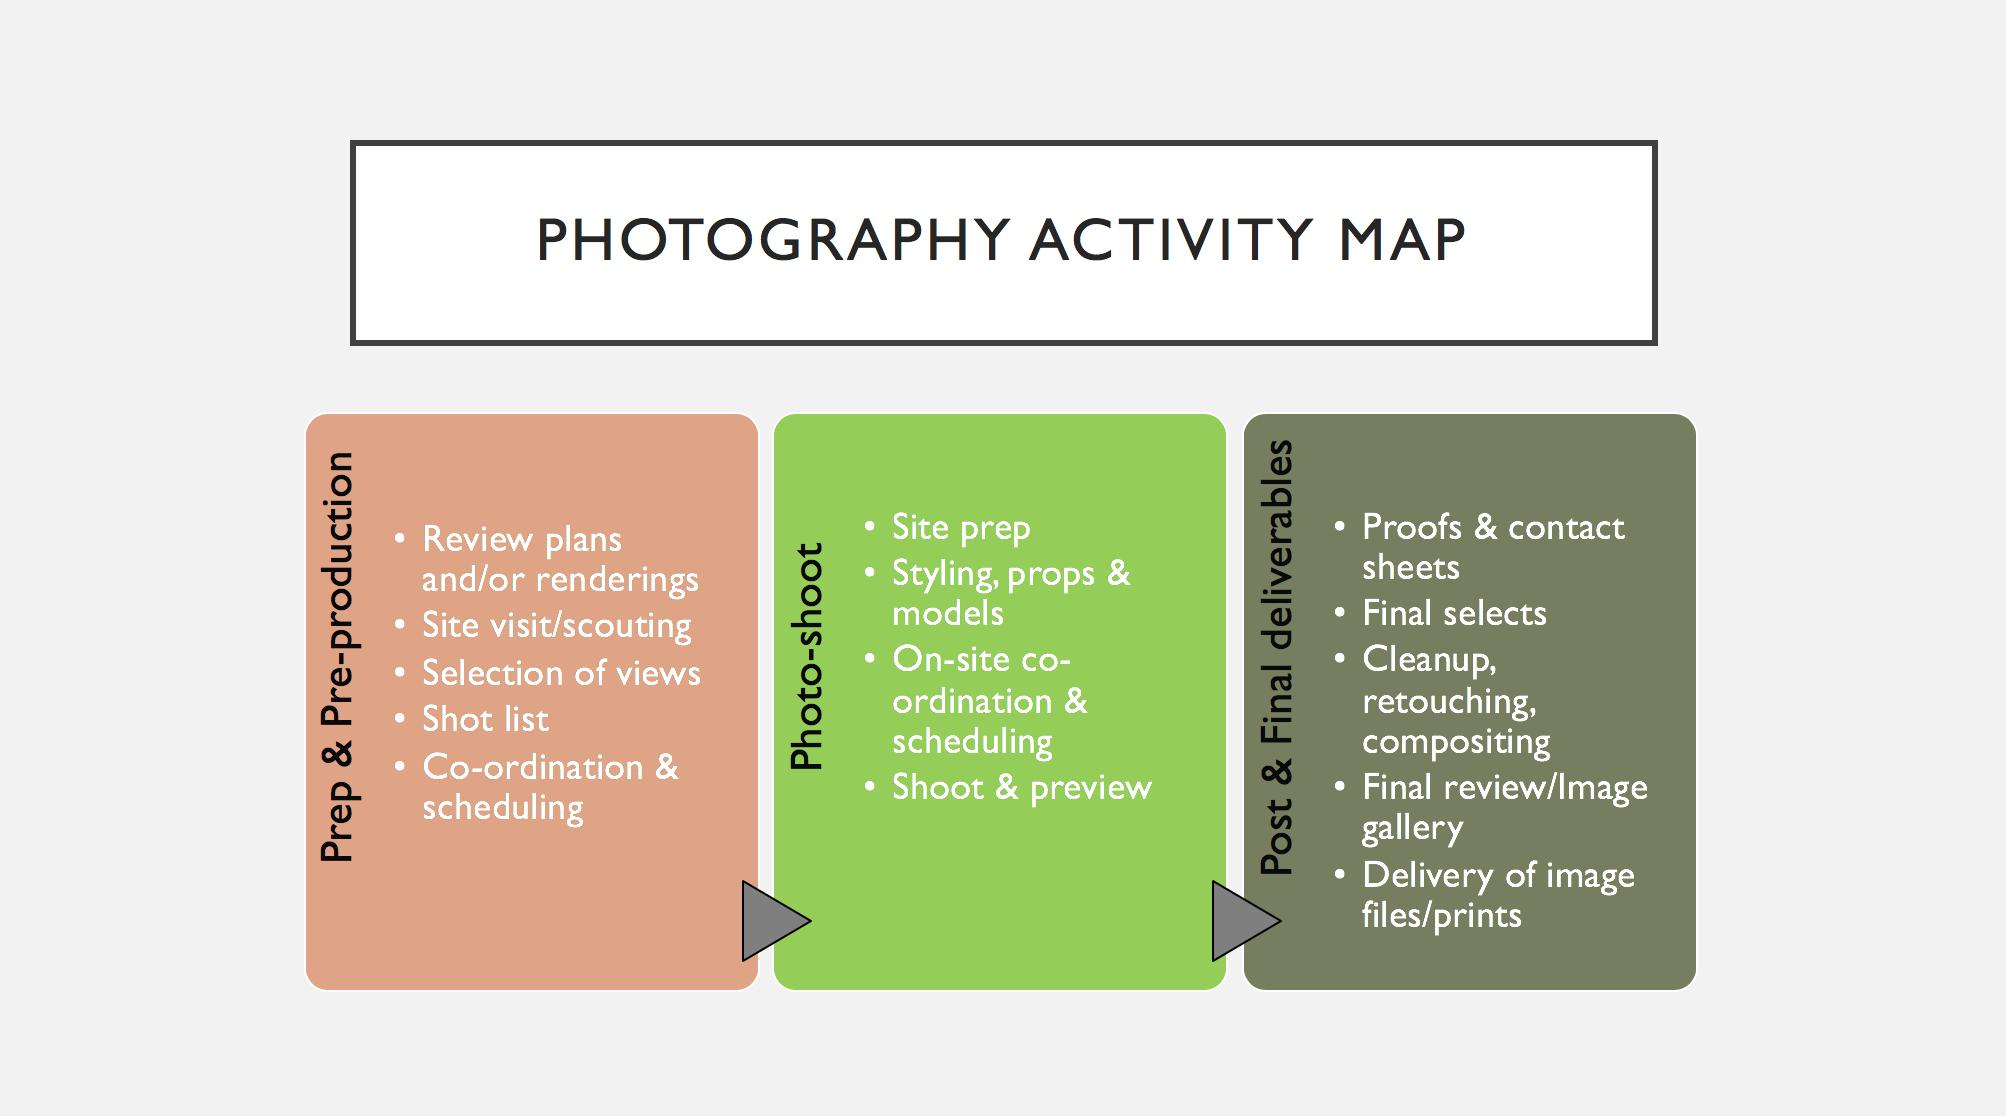 PhotographyActivityMap.png